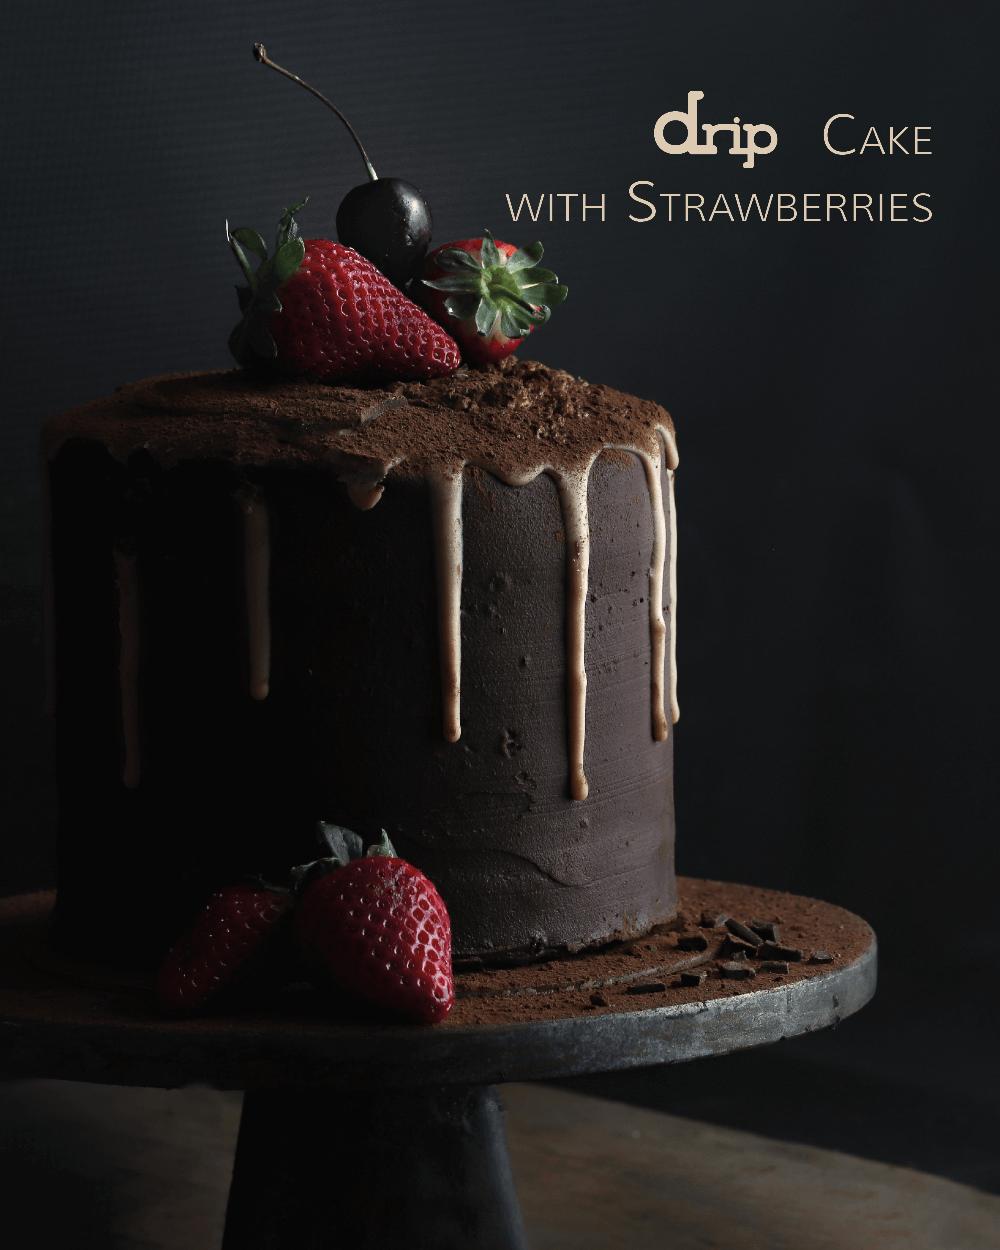 CAKE-DESIGN-DRIP-CAKE-WITH-STRAWBERRIES-responsive